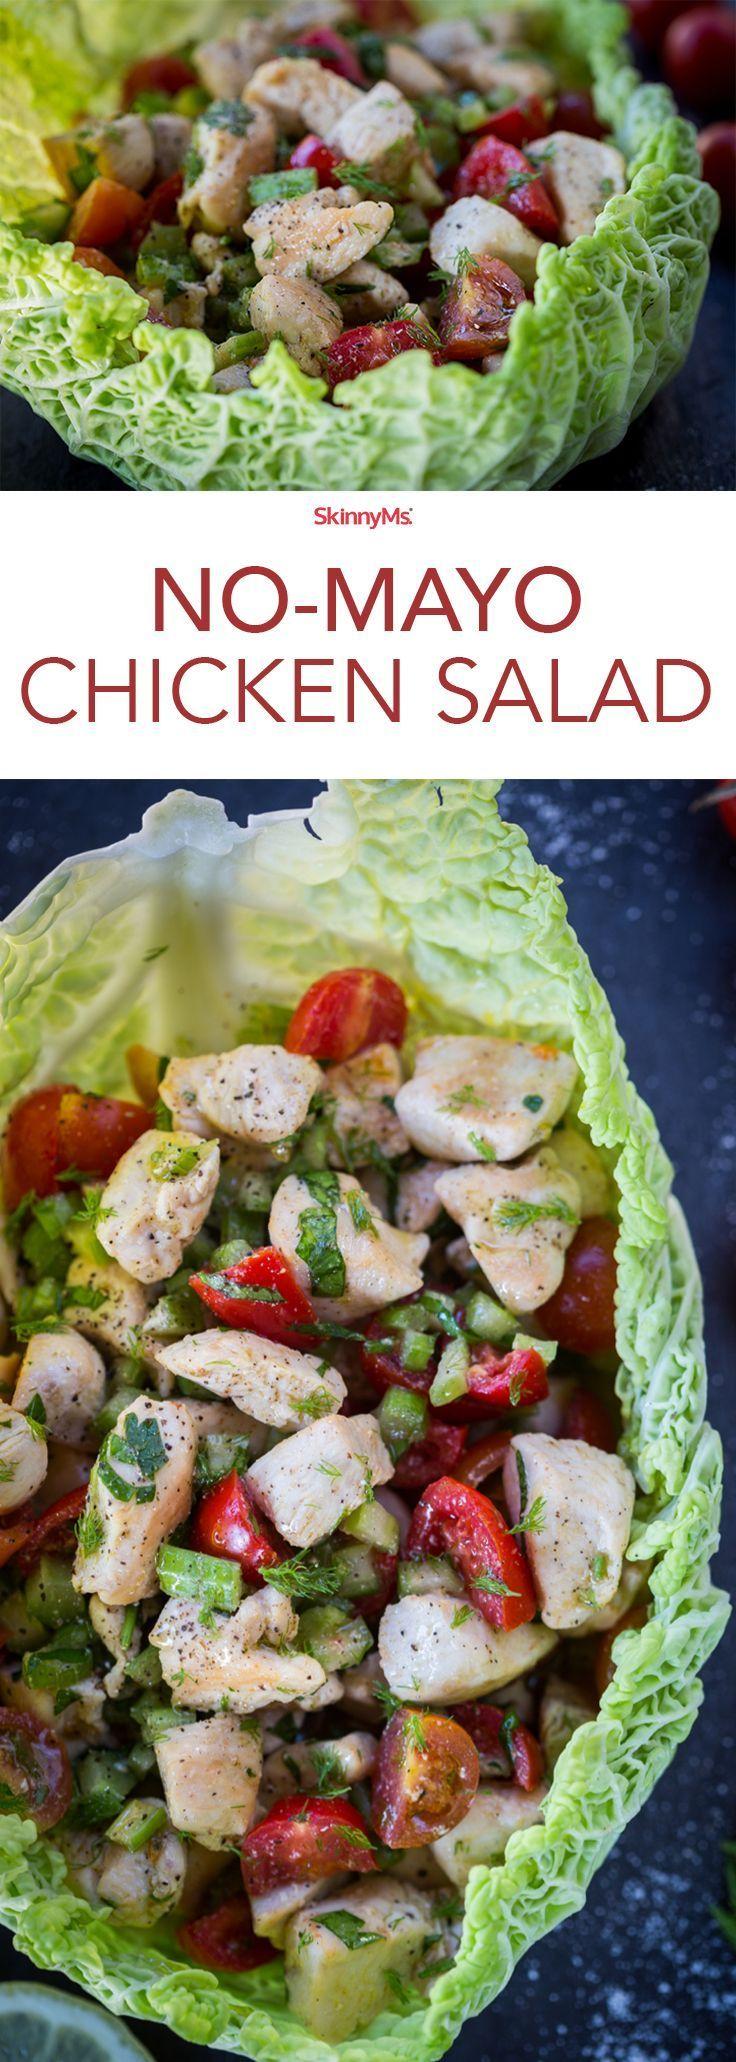 This No-Mayo Chicken Salad is a snap to make and guaranteed to satisfy!